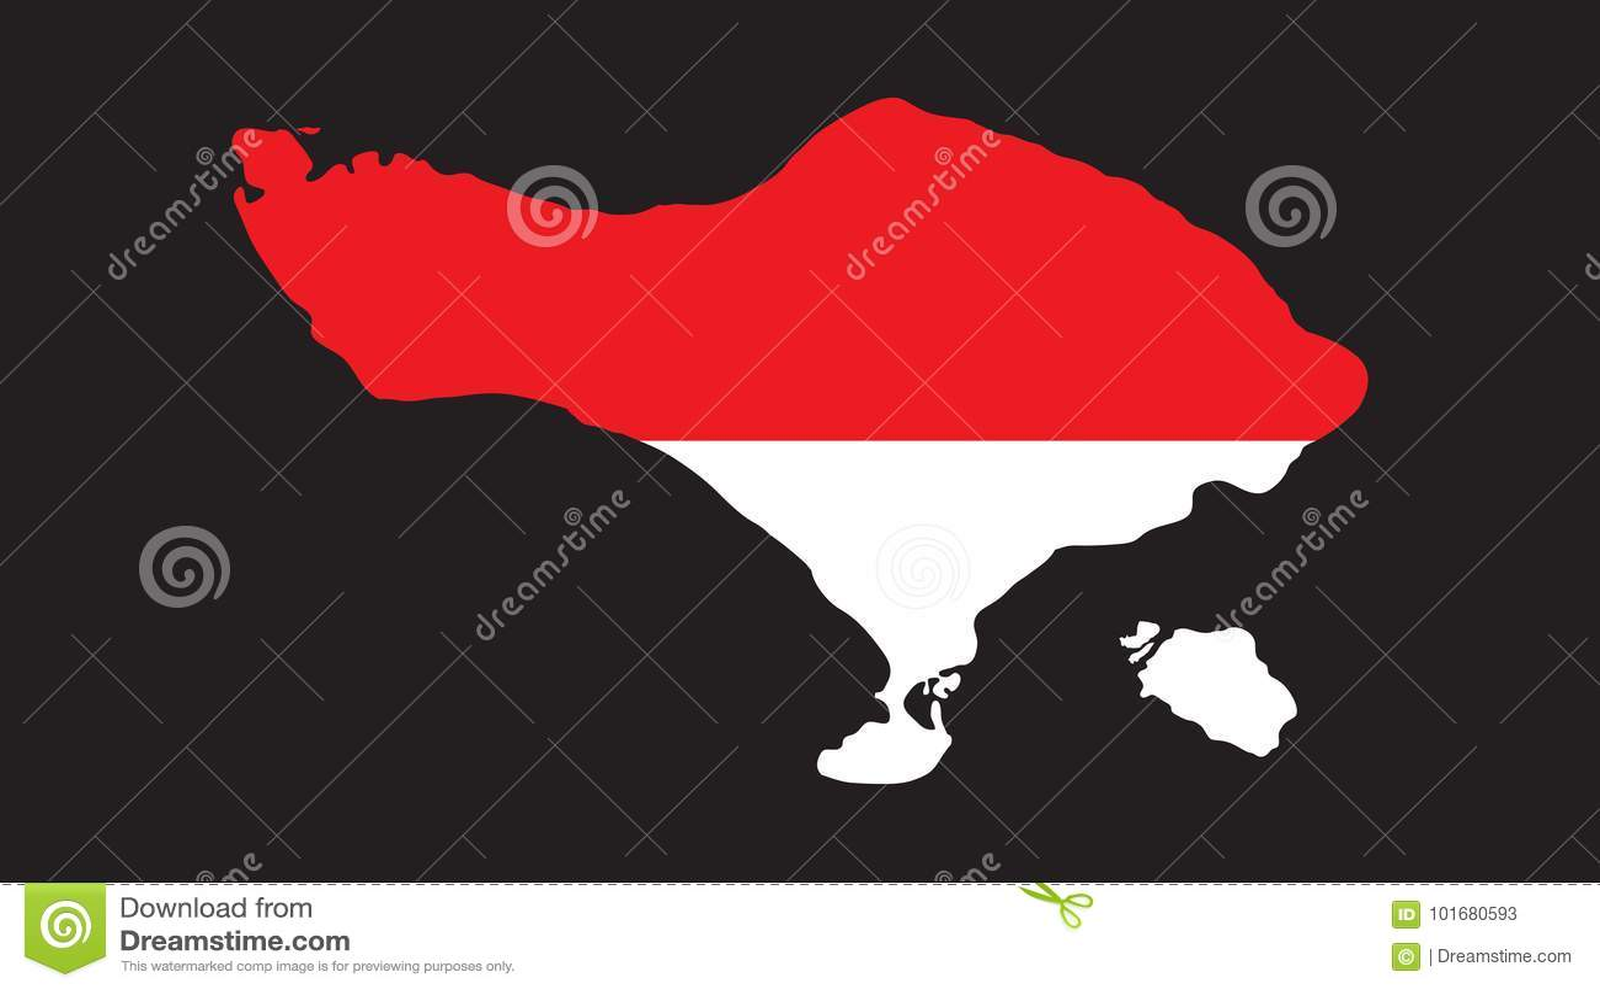 High Quality Bali Island Vector In Indonesian Flag Stock Vector